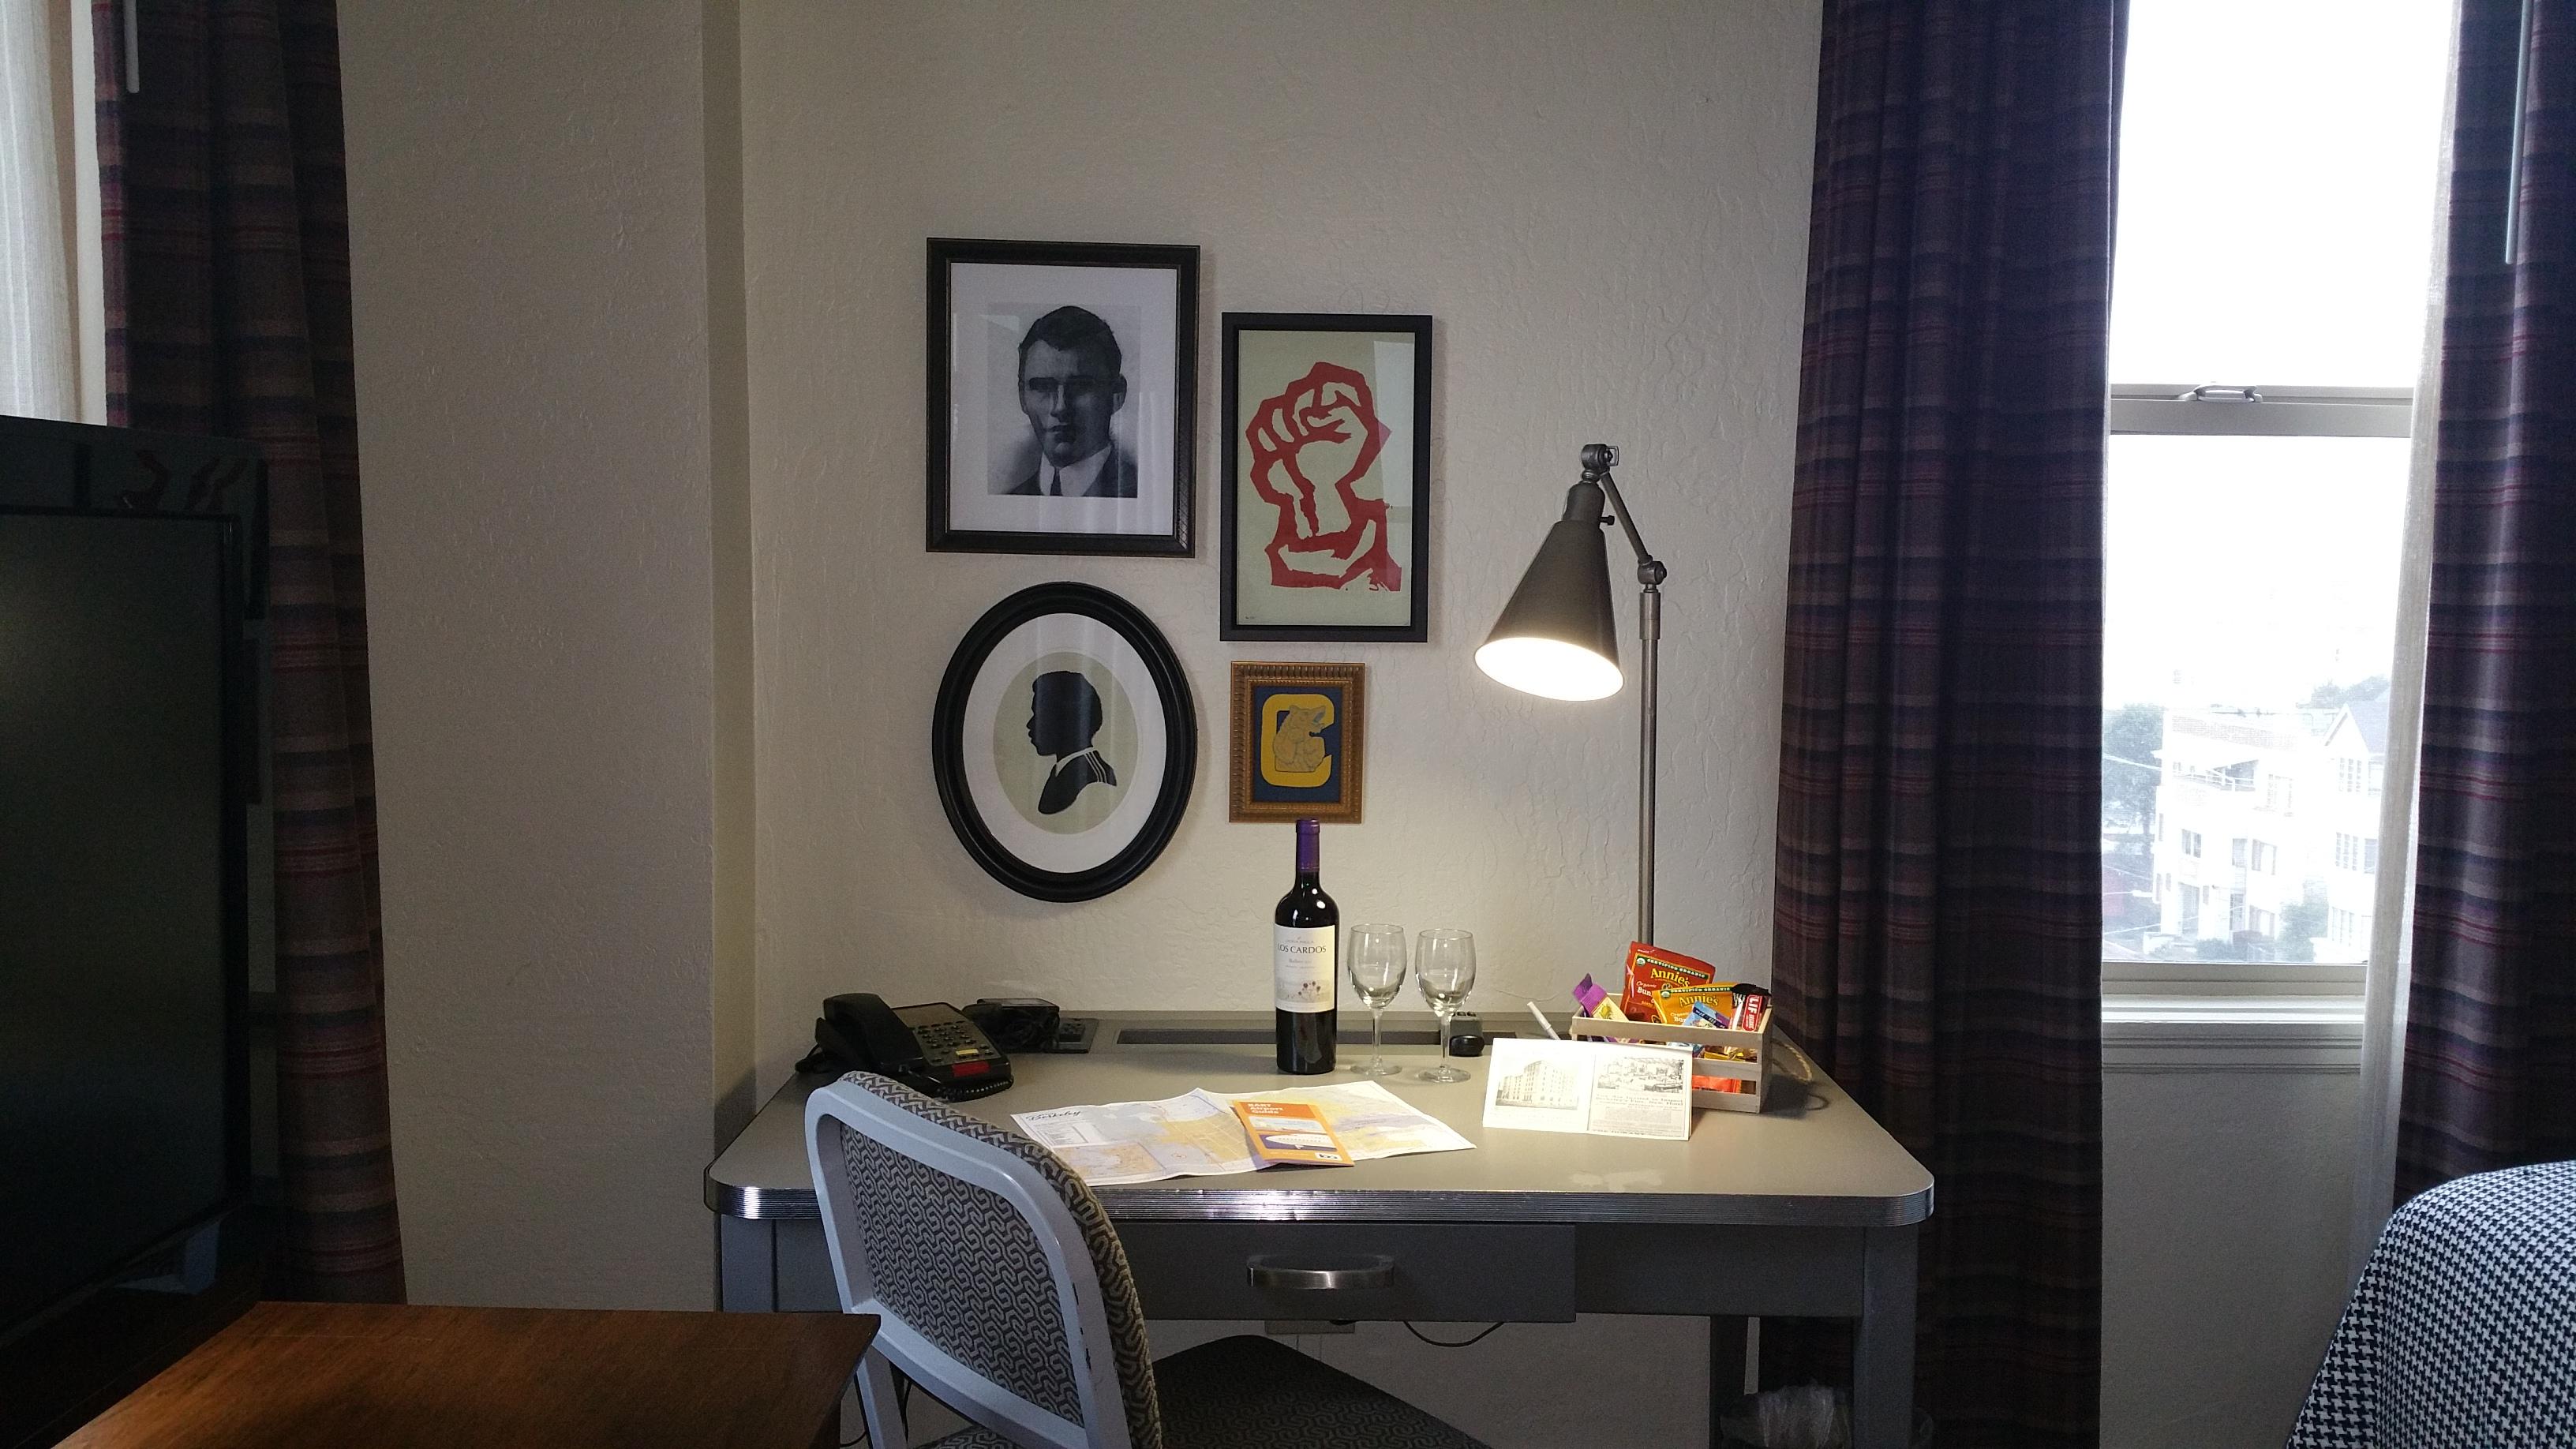 suites hotel shot fanta room fantasuites rooms corner com mn greenwood cupids the dsc entryway of themed